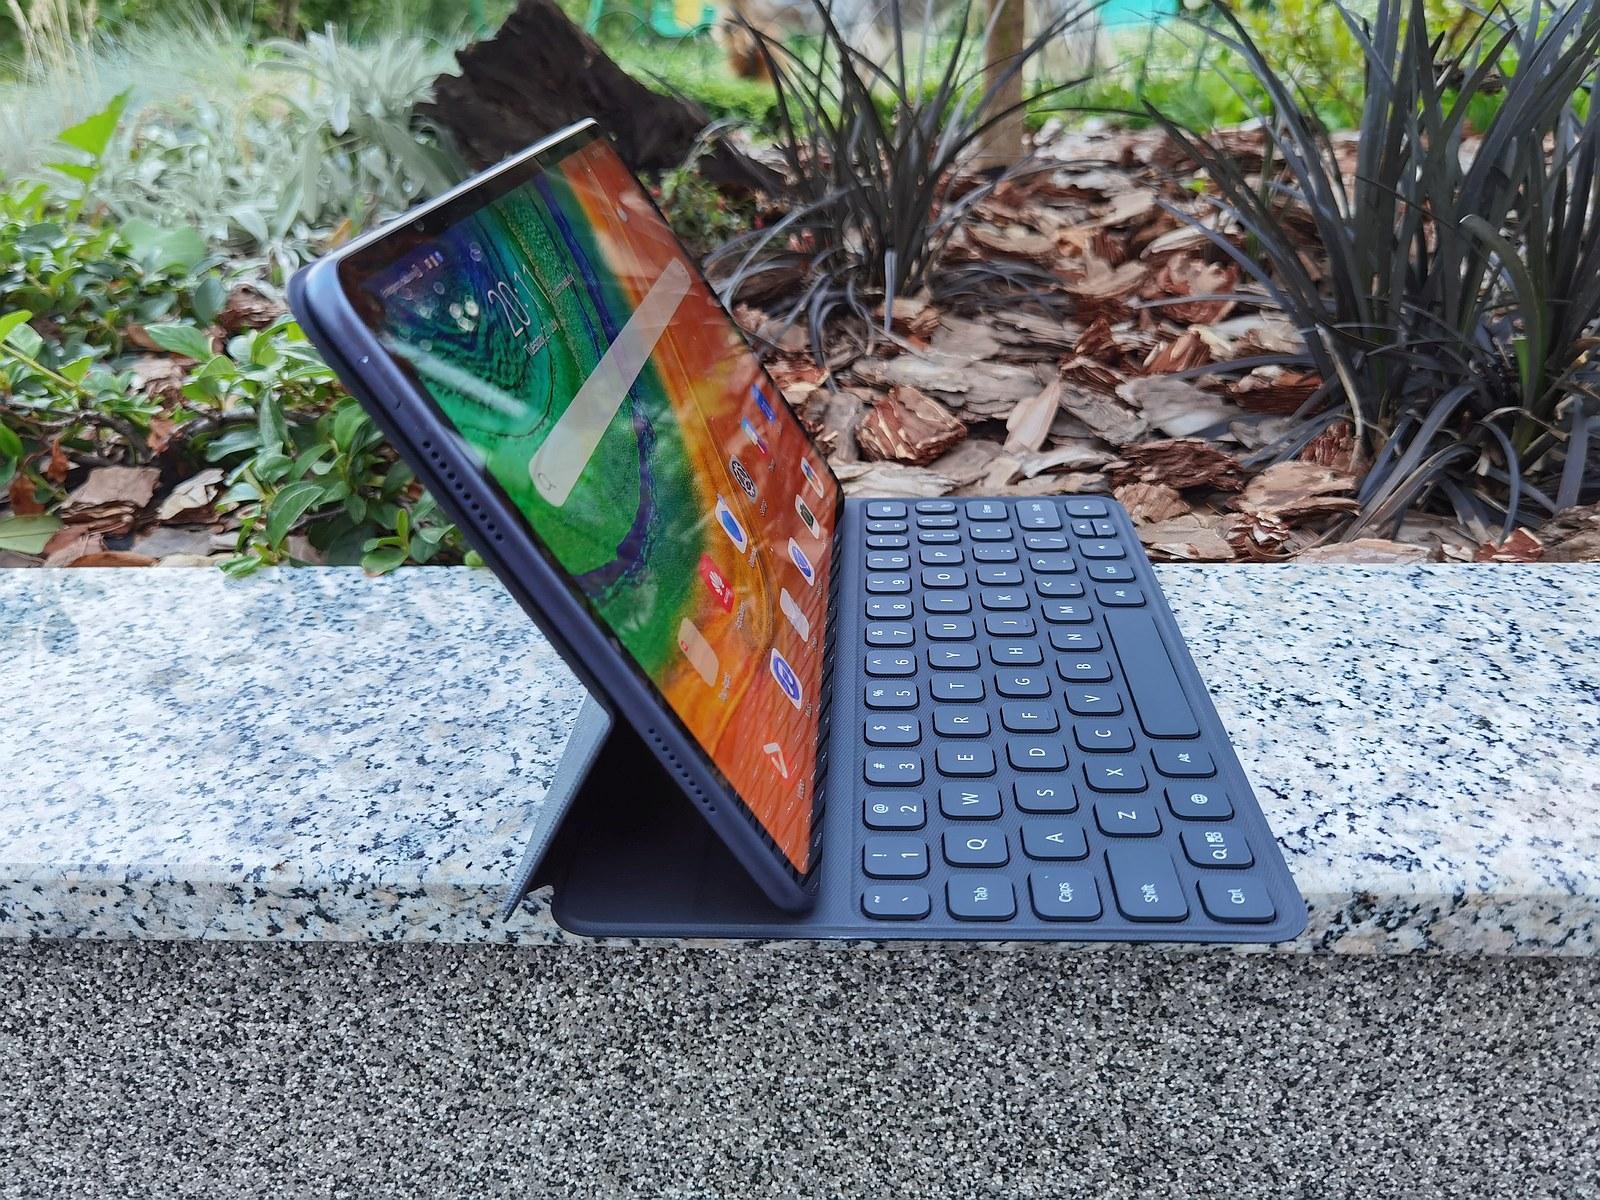 MatePad Pro 10